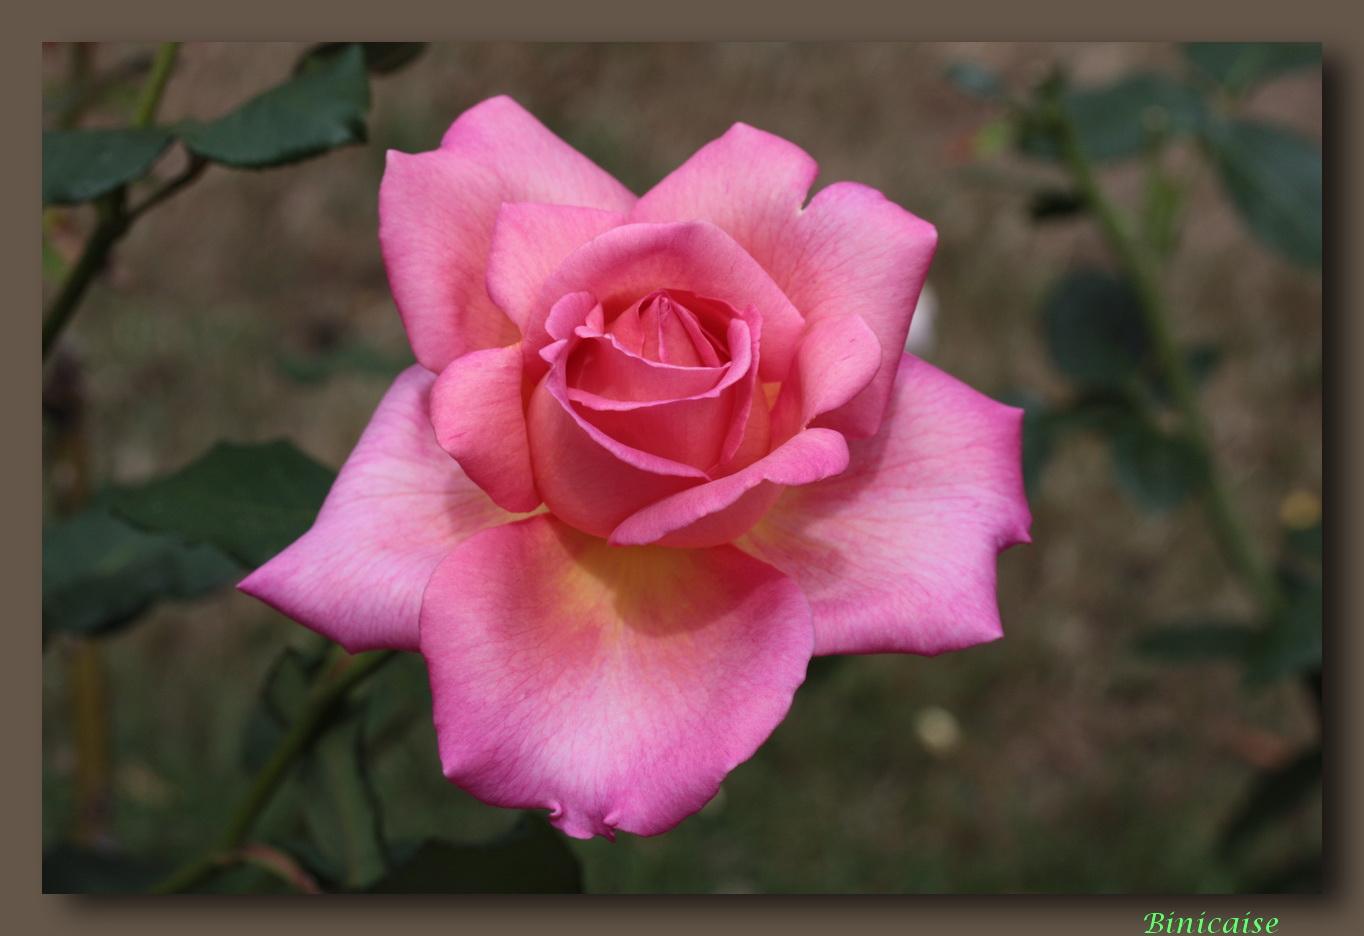 rose201007.jpg